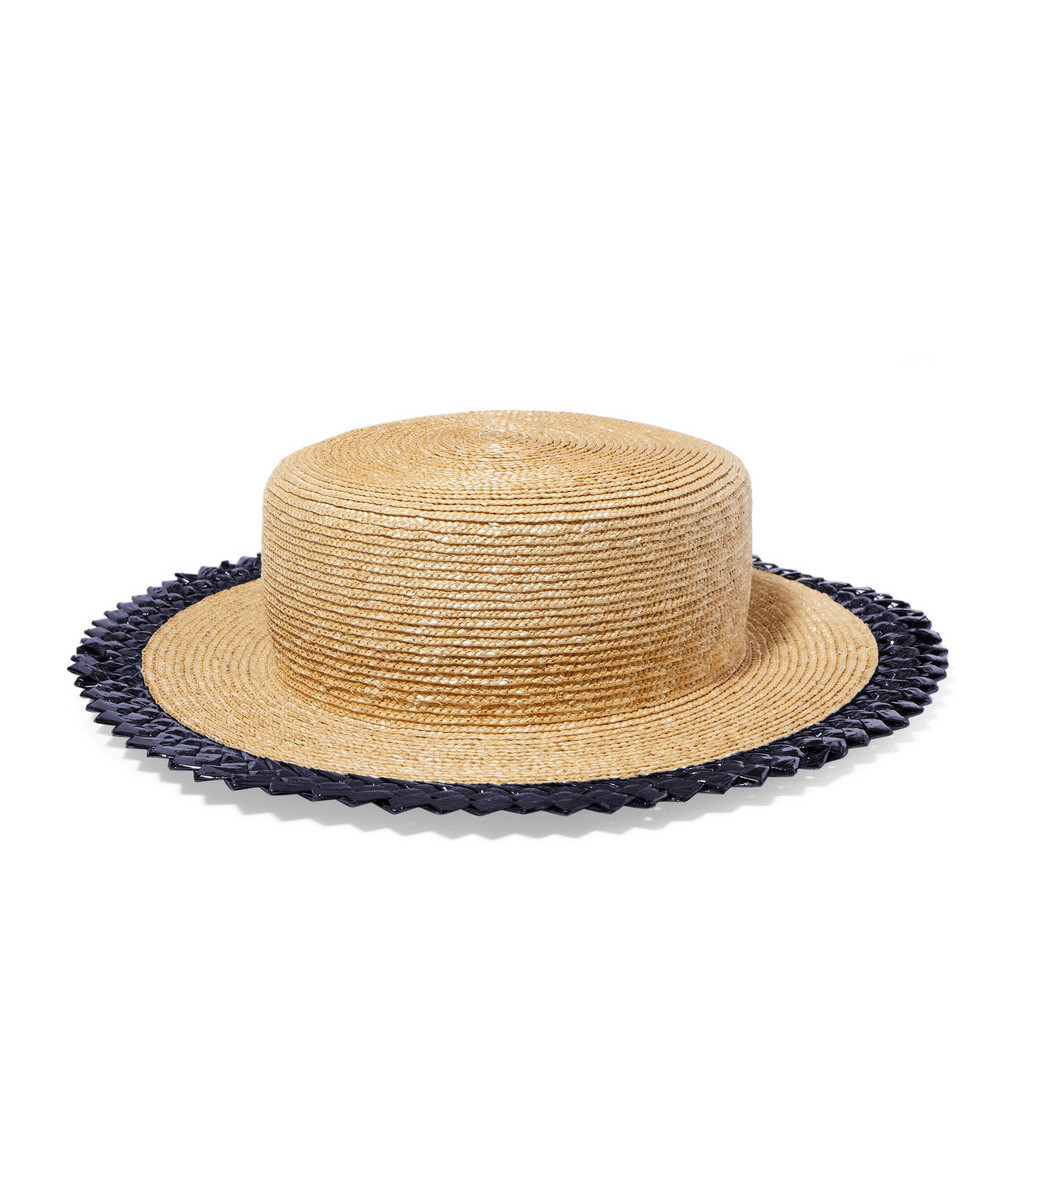 Gigi Burris Agnes Racello-Trimmed Straw Hat